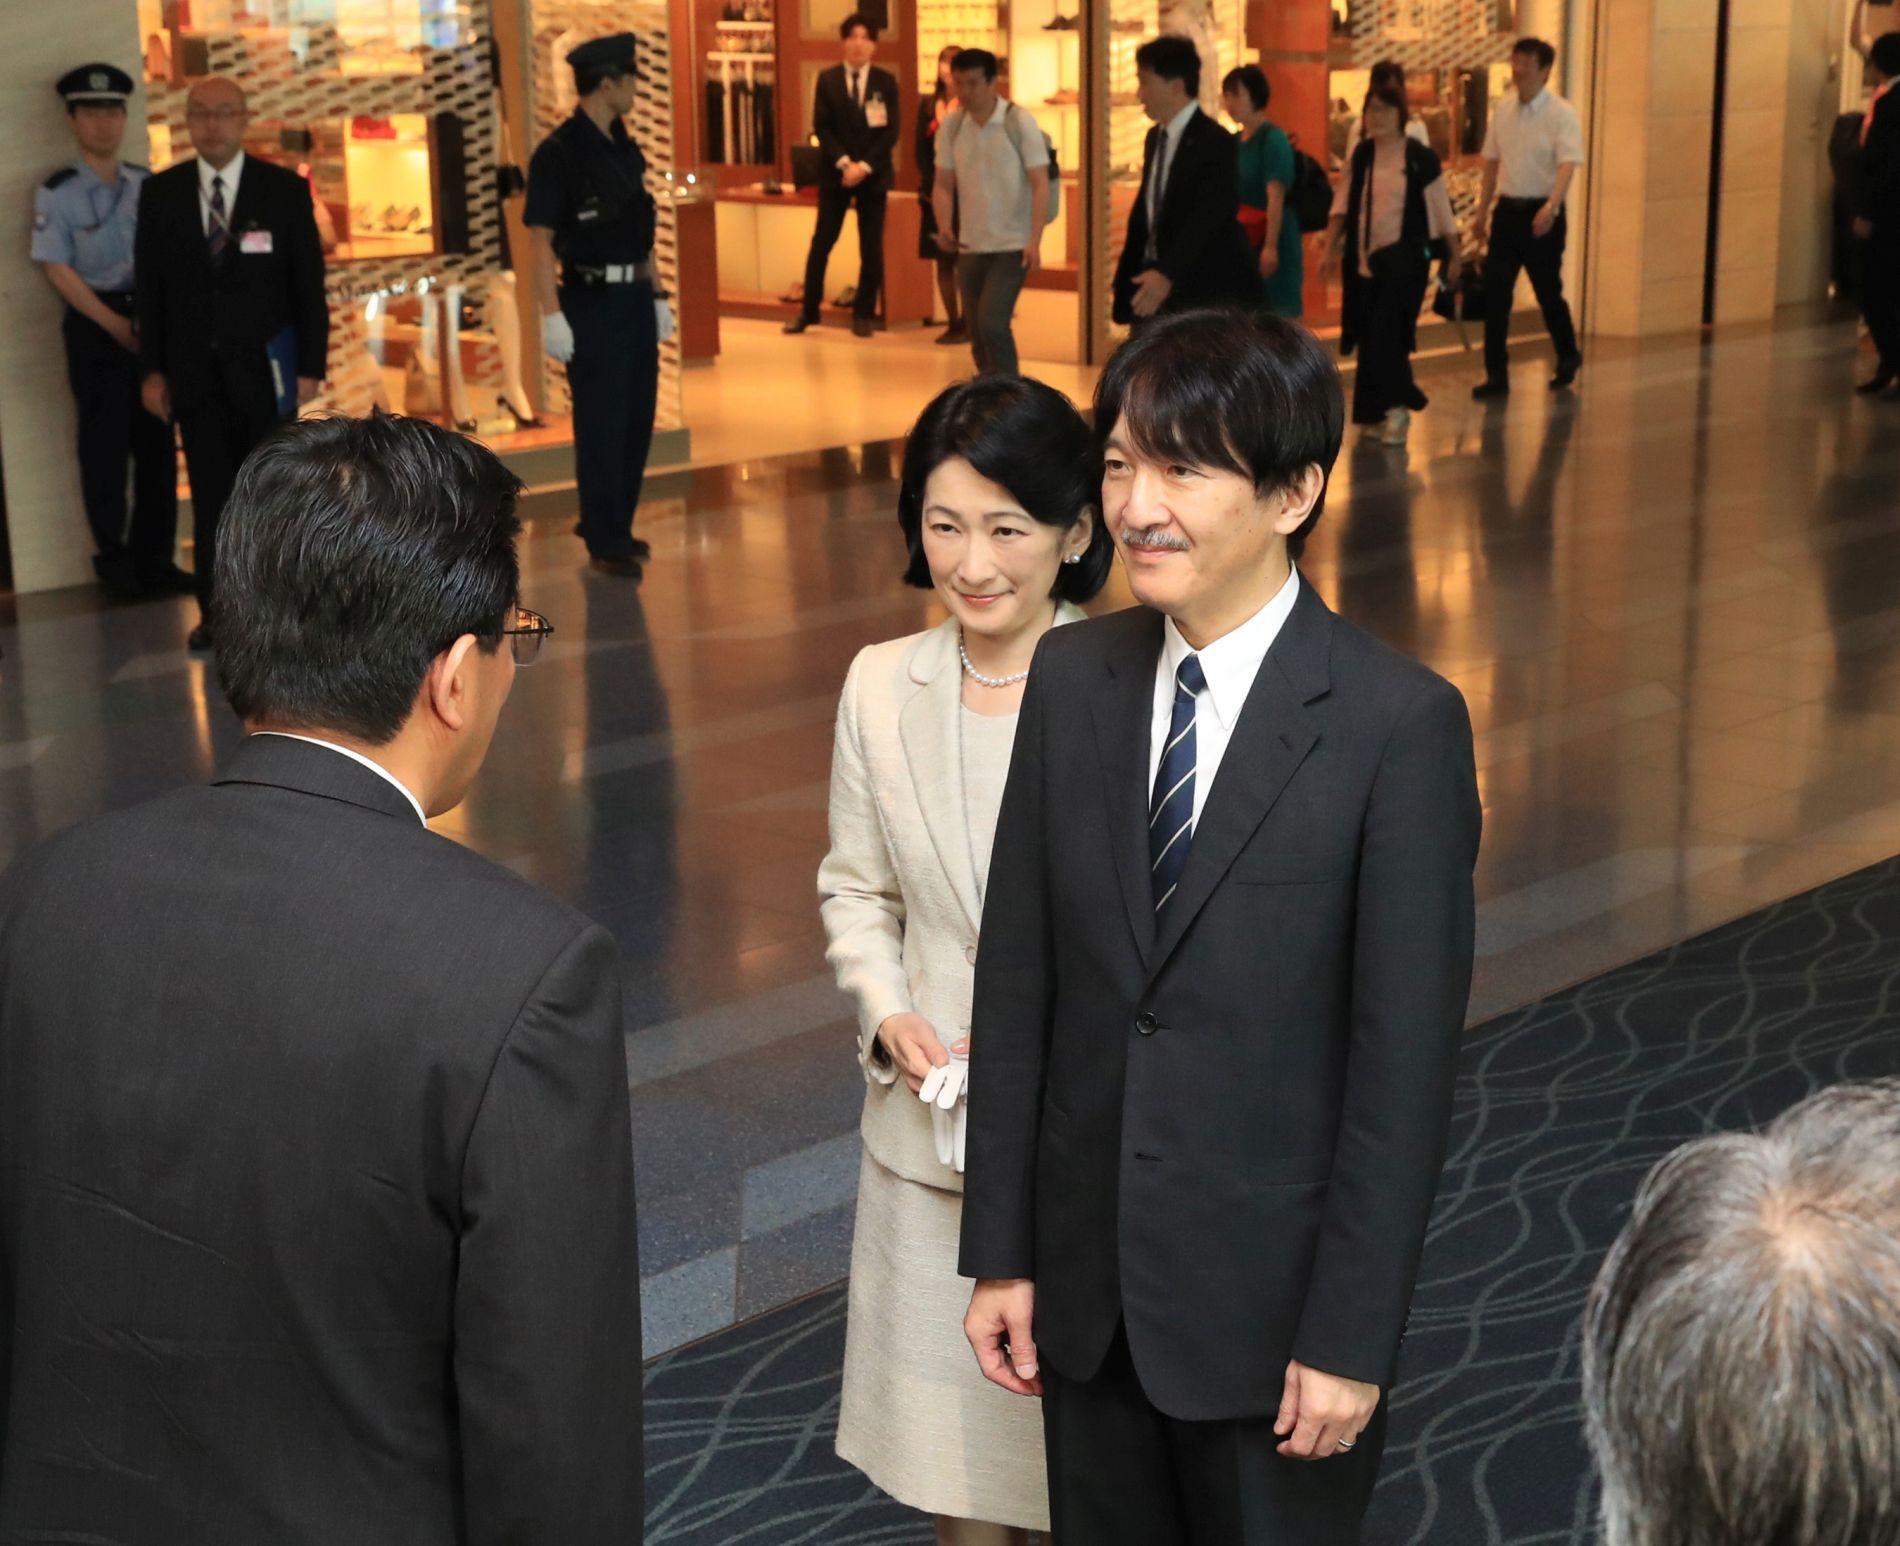 Japan Crown Prince and Princess Visit Poland